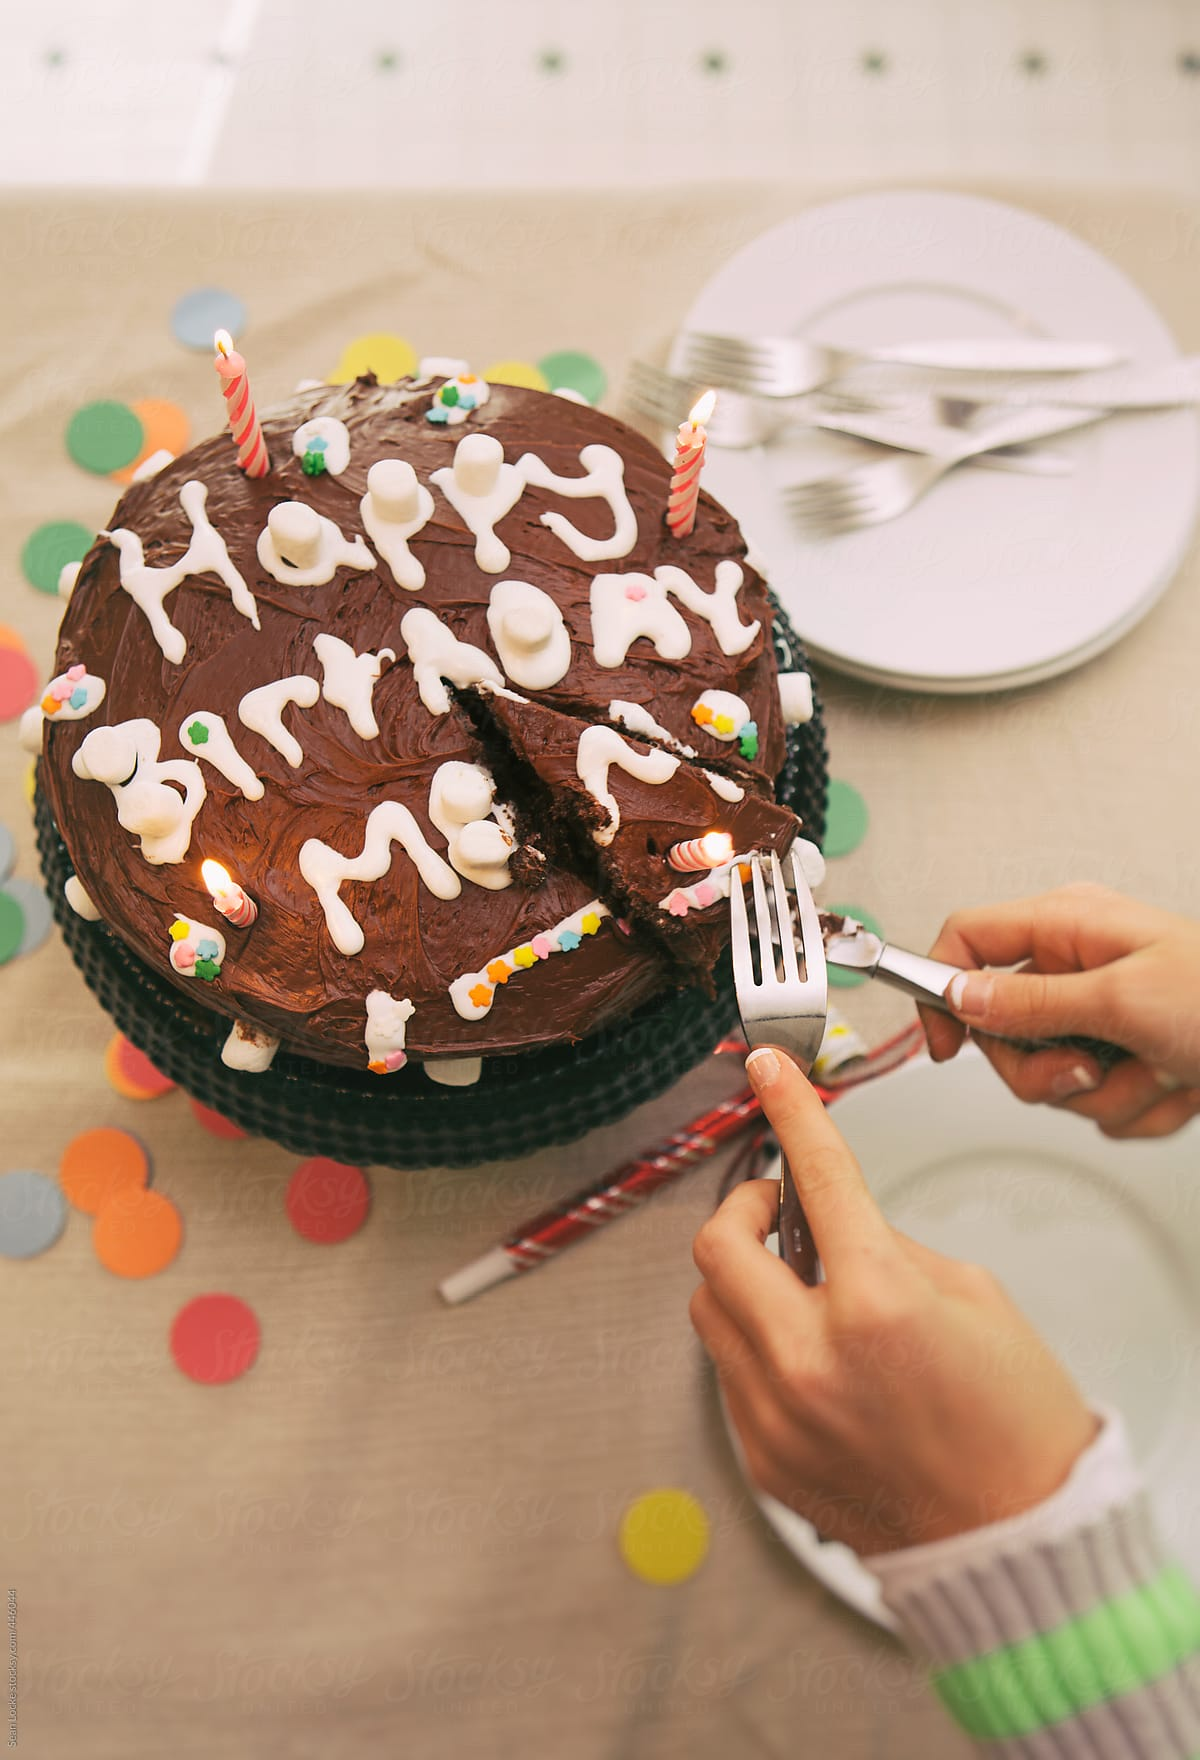 Girl Cutting Slice From Homemade Birthday Cake For Mom Stocksy United